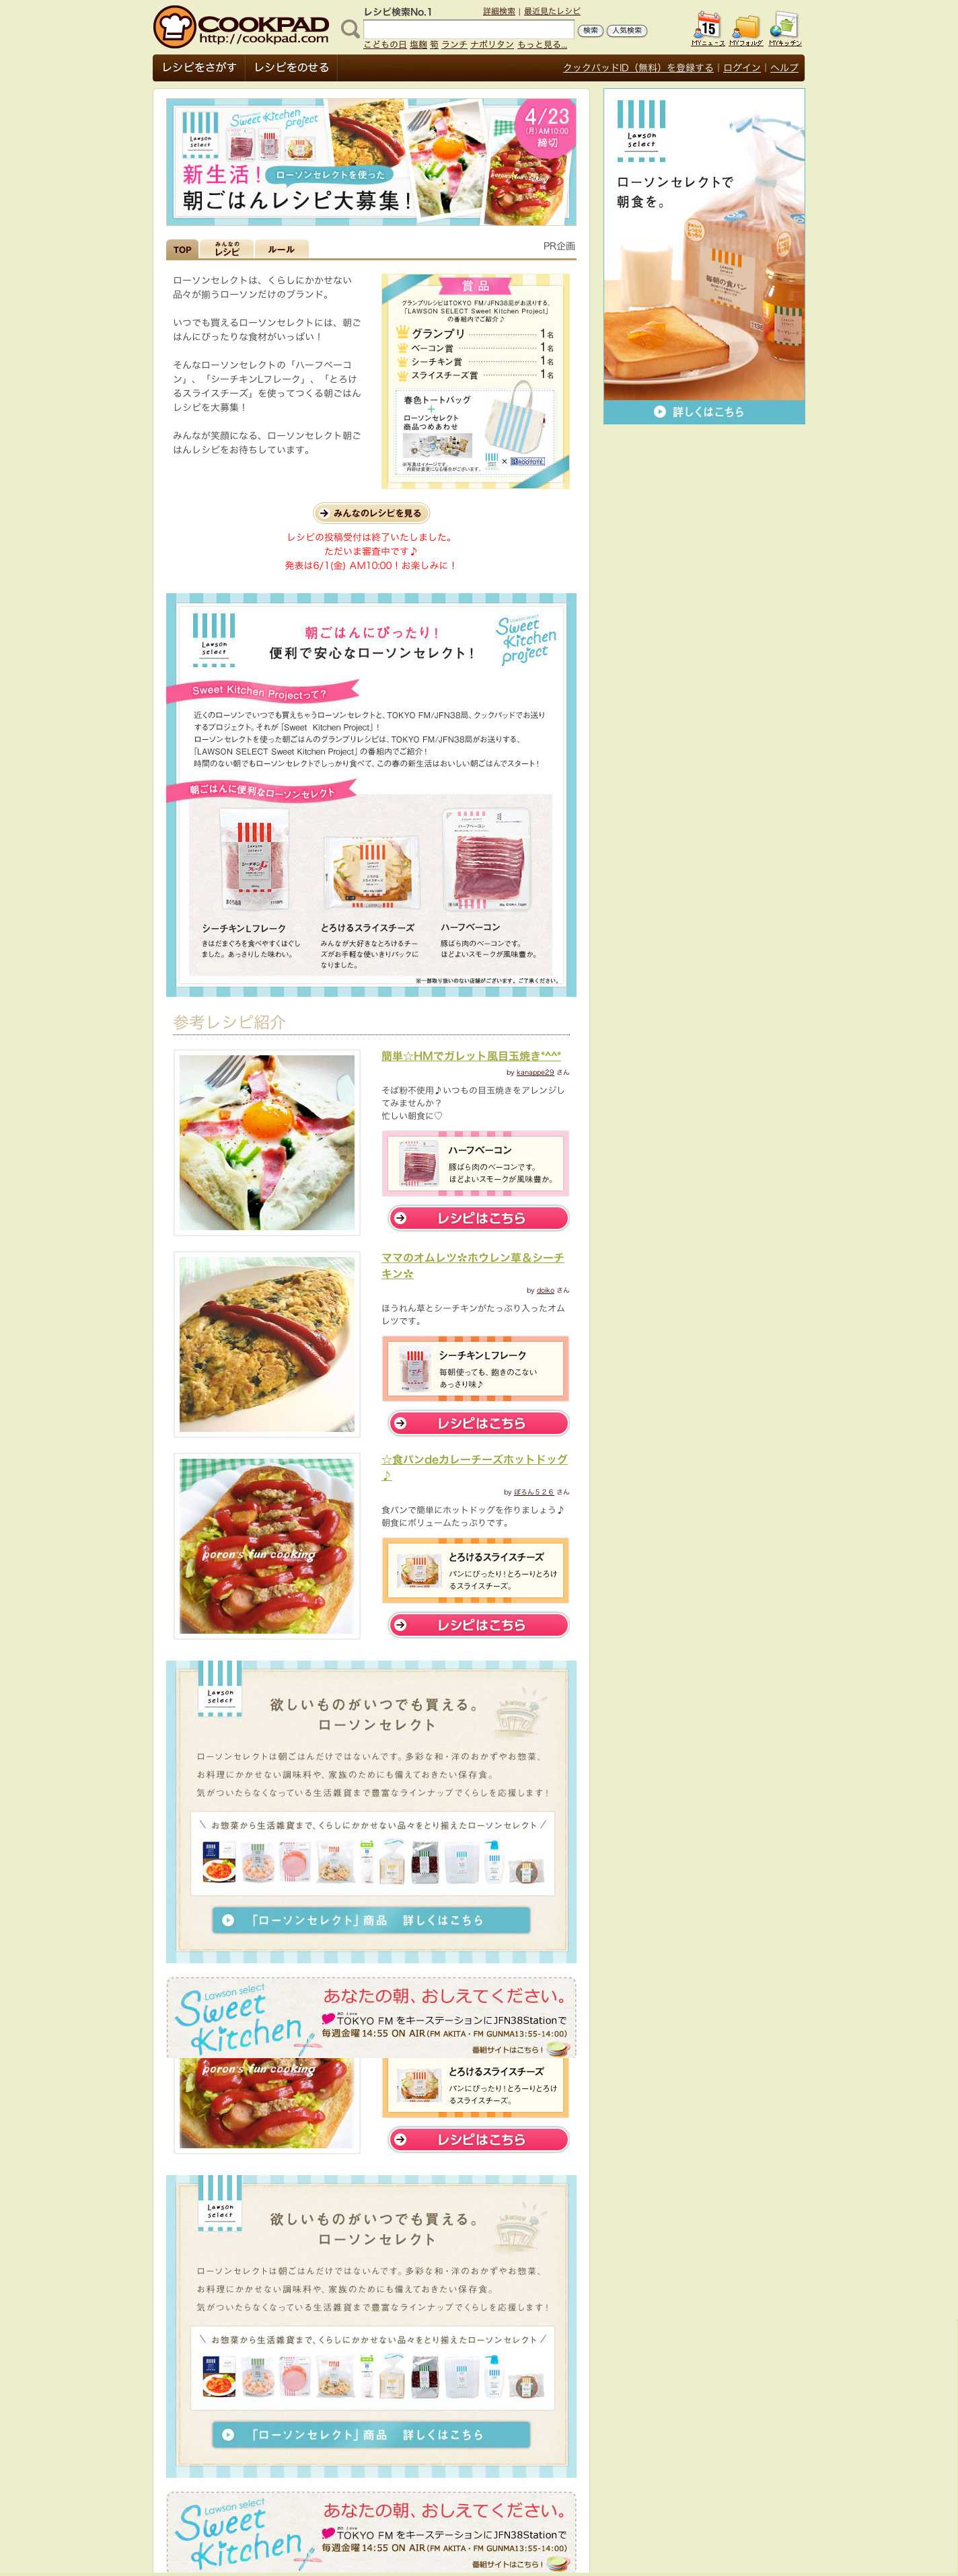 http://cookpad.com/pr/contest/index/412